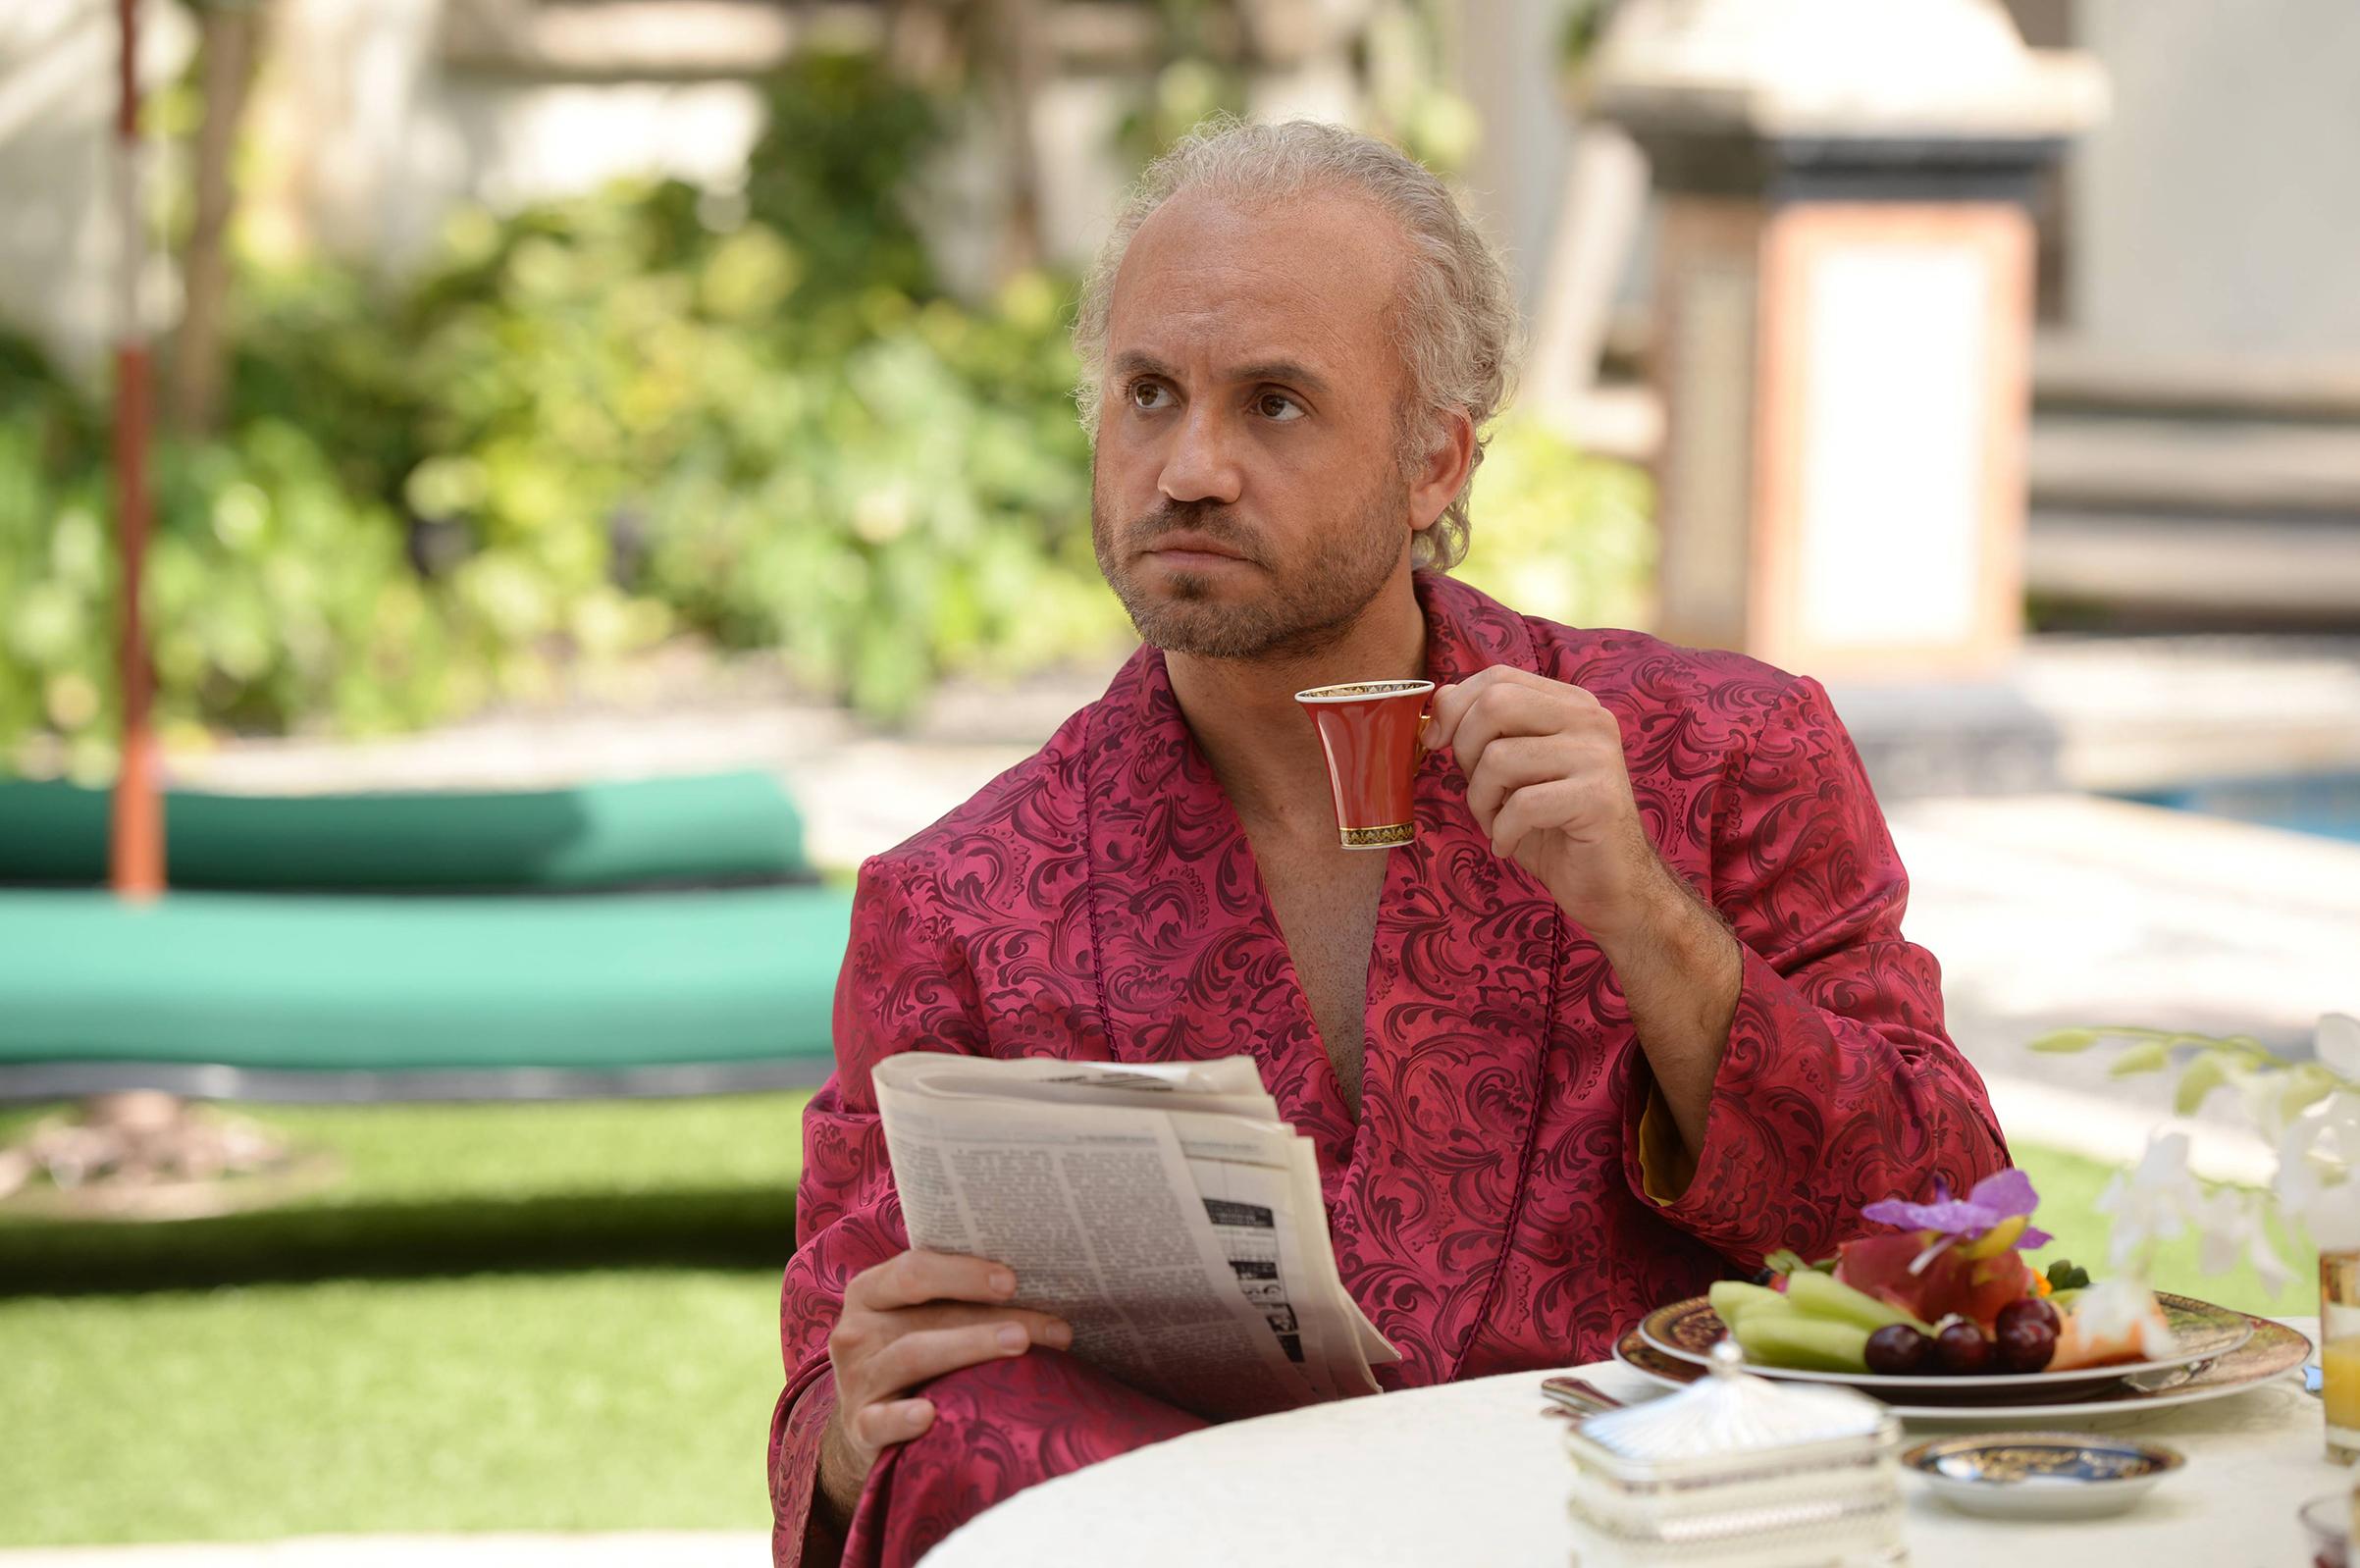 Edgar Ramirez as Gianni Versace in Versace: American Crime Story.